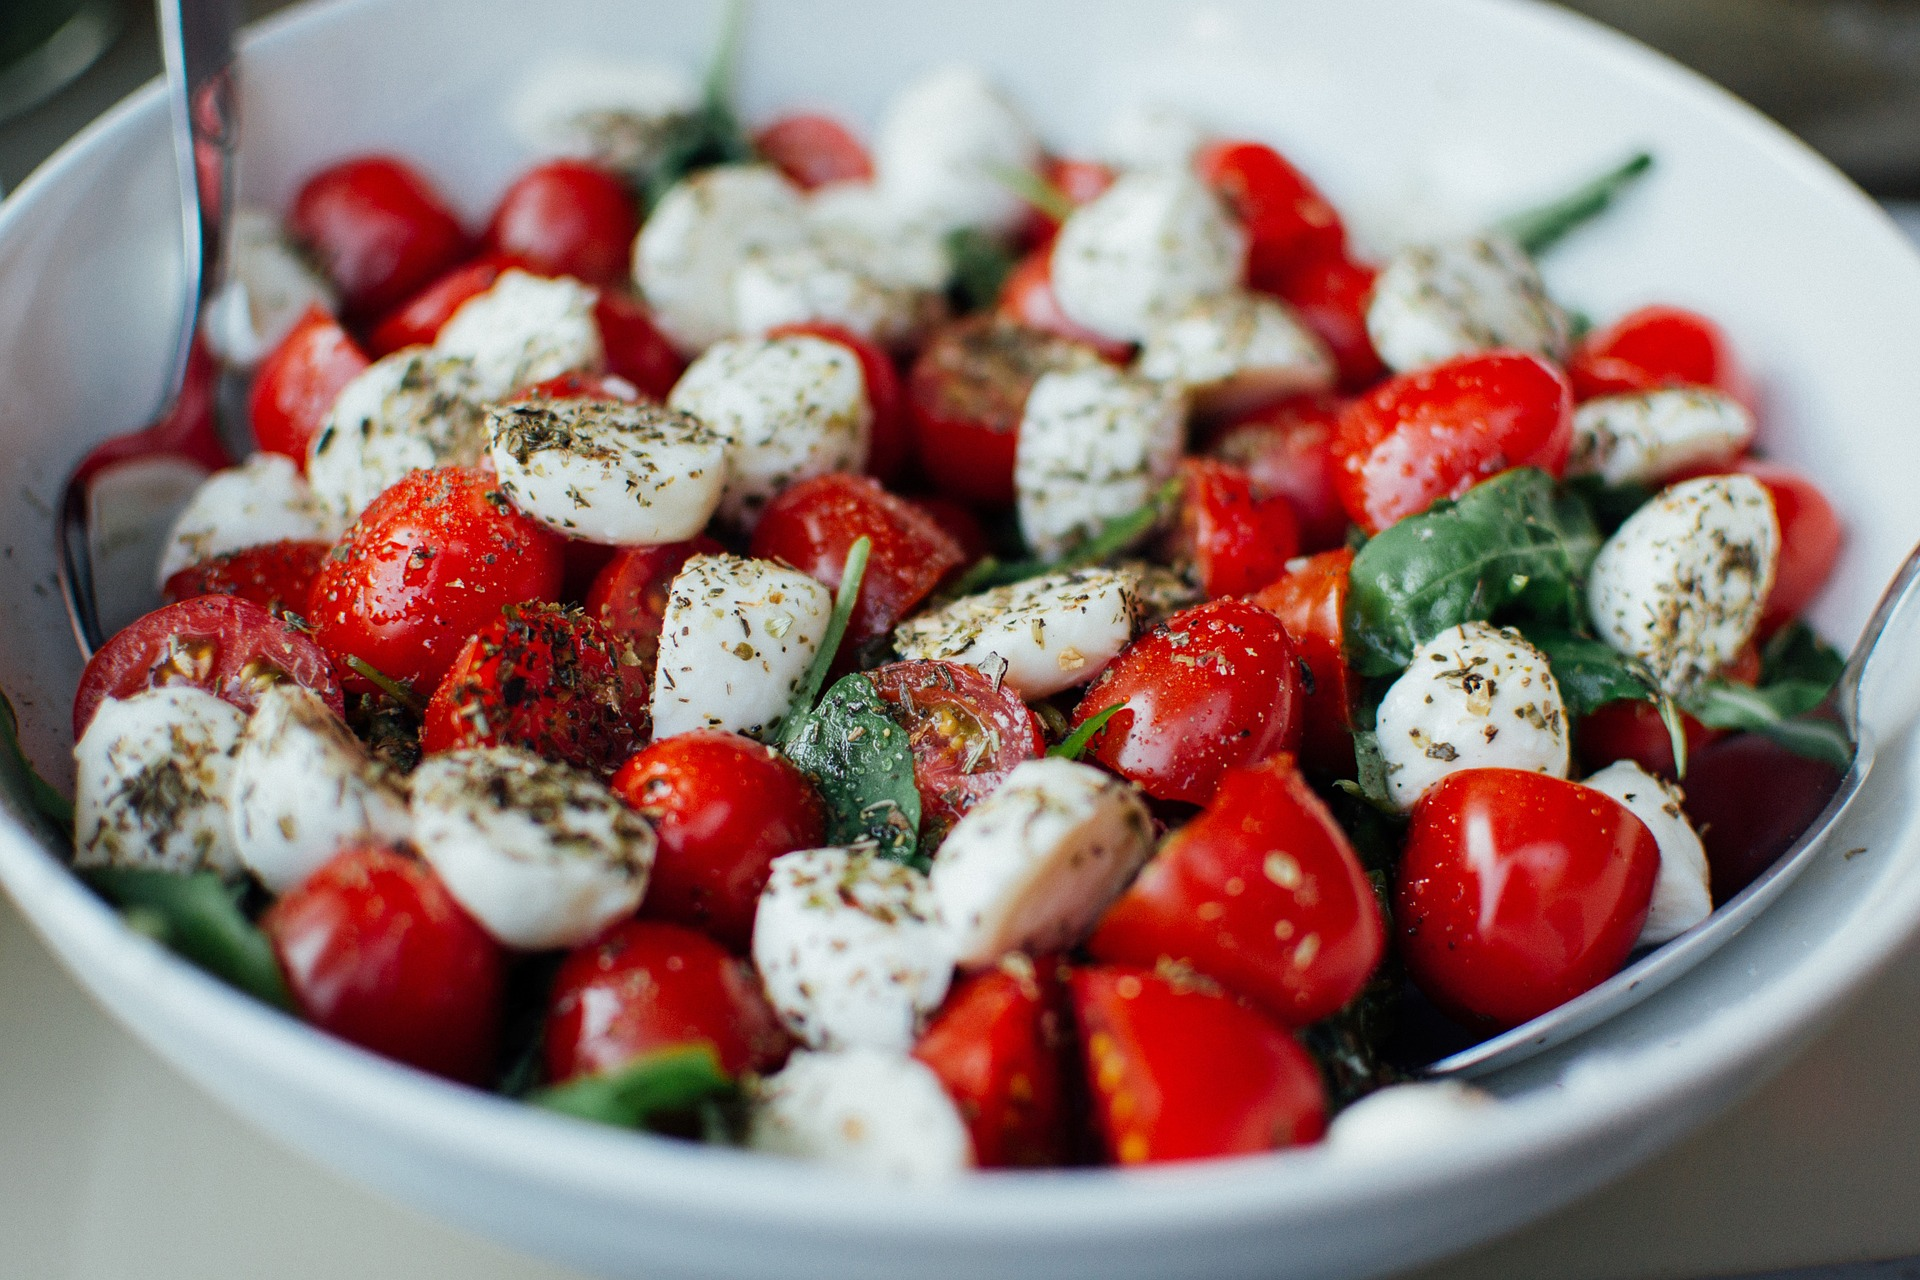 Salata de rosii cu branza - sfatulparintilor.ro - pixabay_com - tomatoes-925698_1920